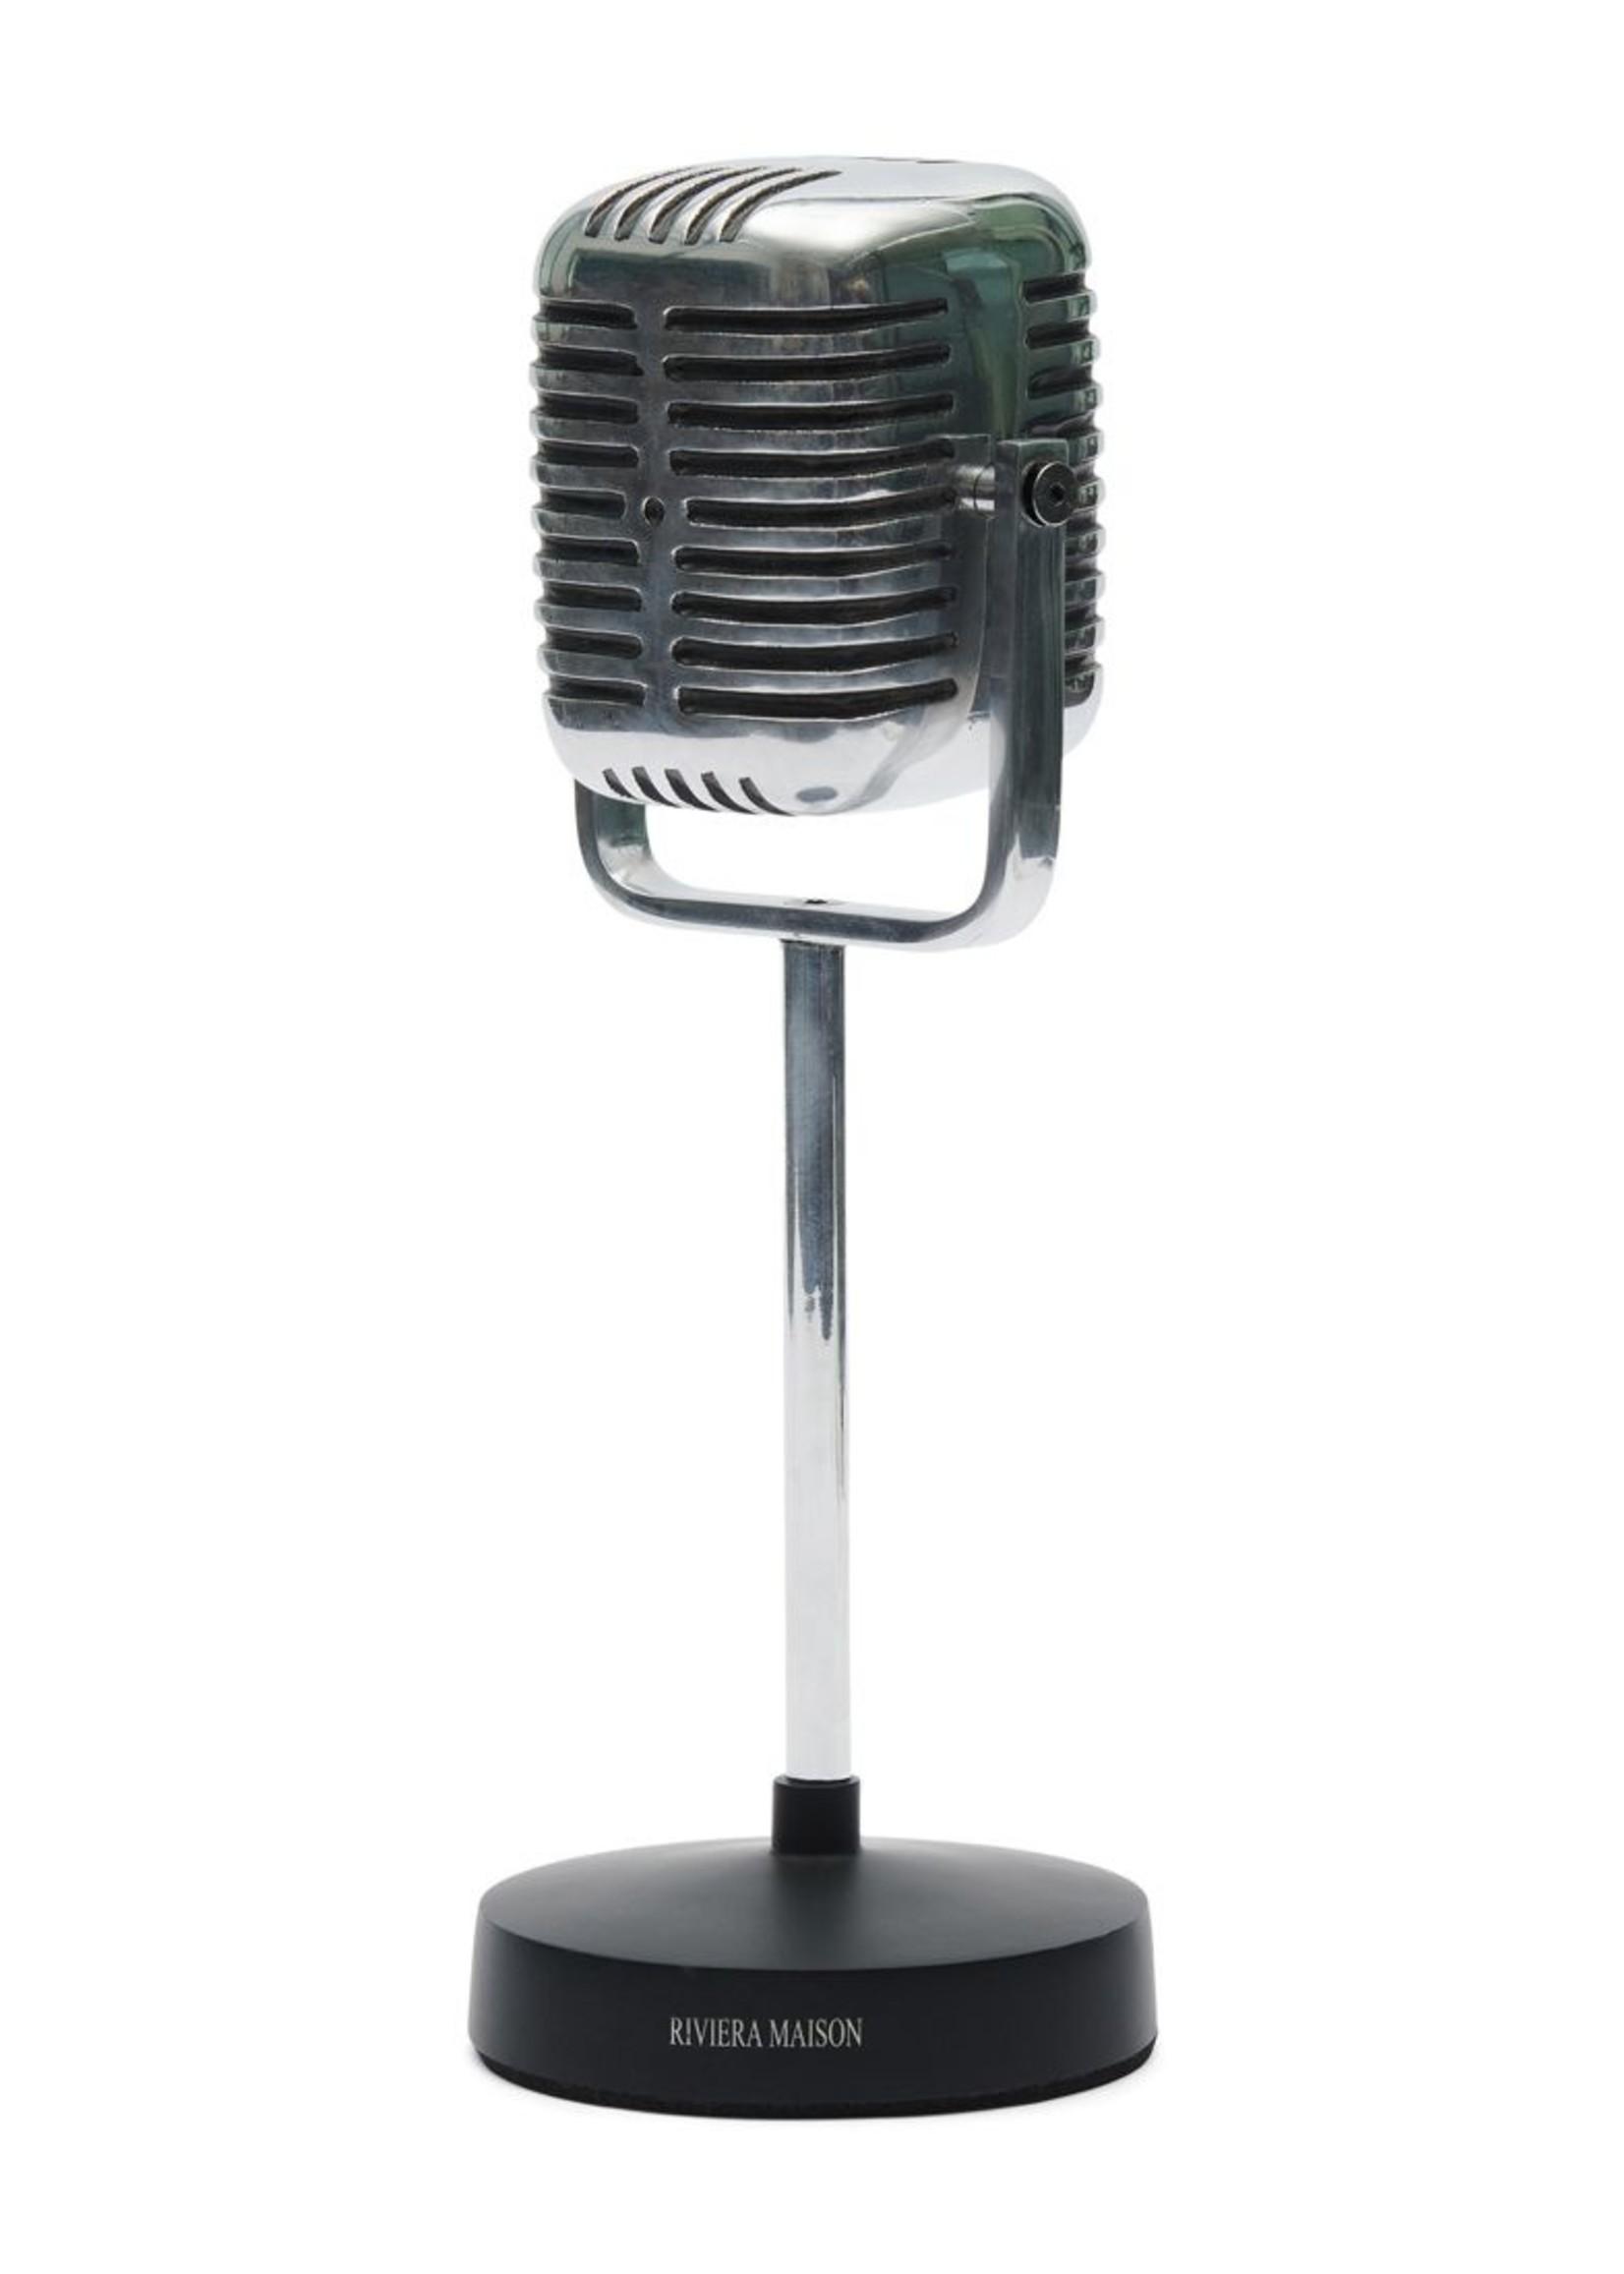 Riviera Maison RM Microphone Statue